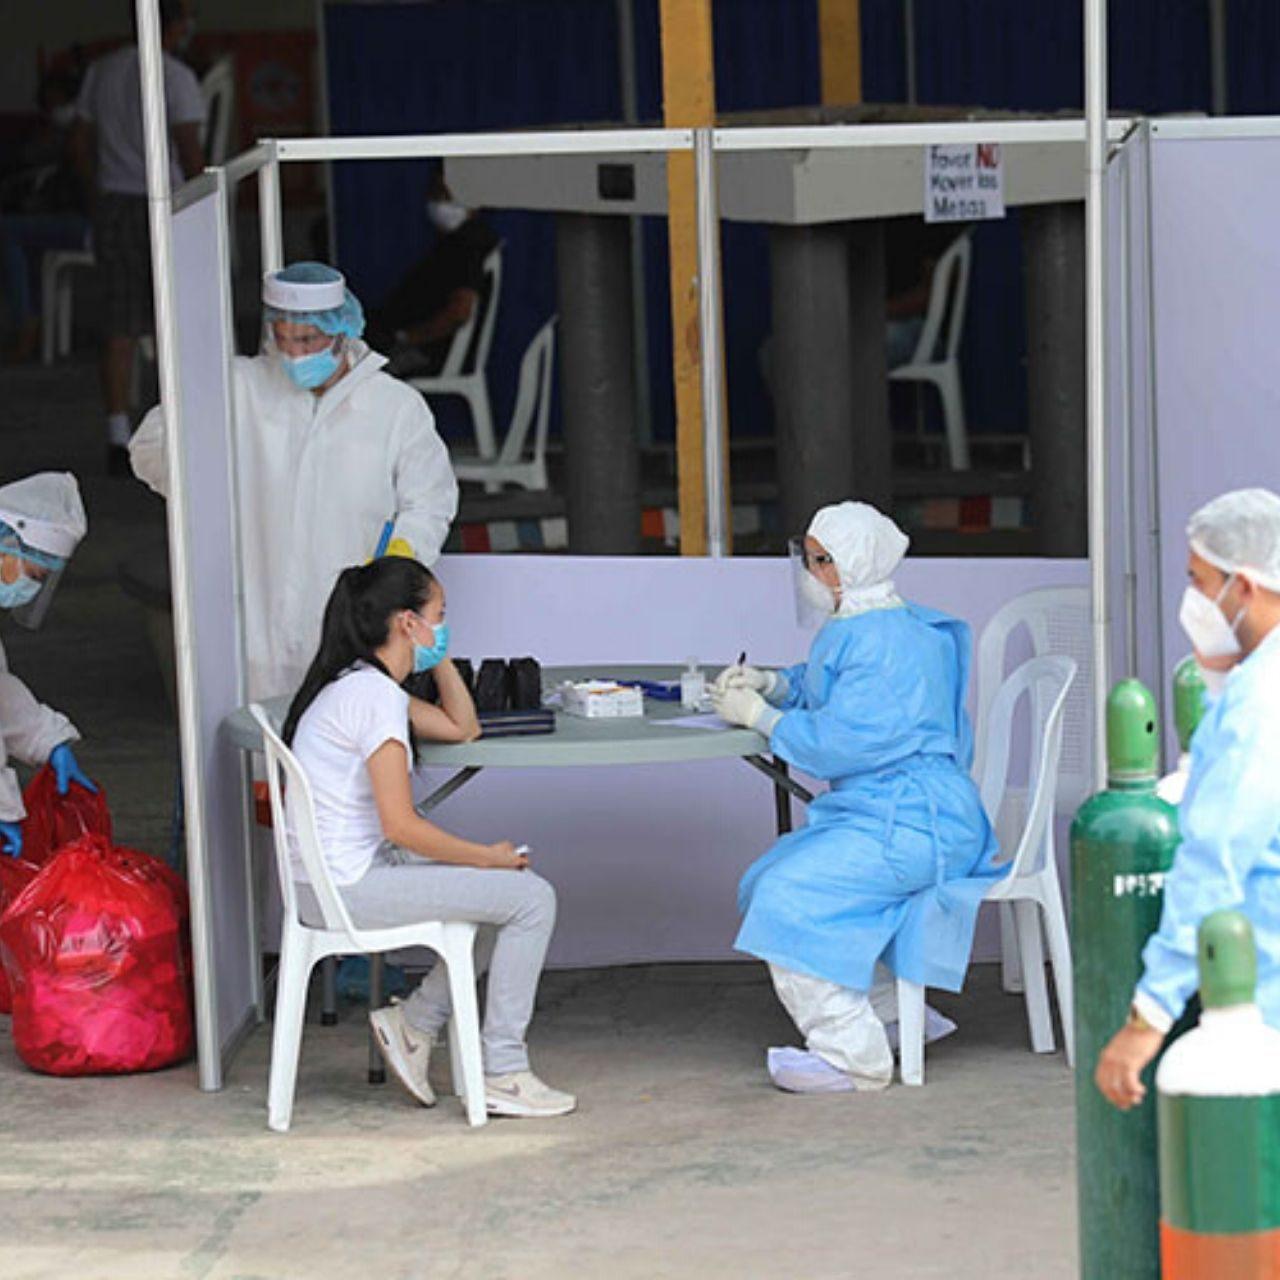 Centros de triages la opción momentánea ante colapso de hospitales